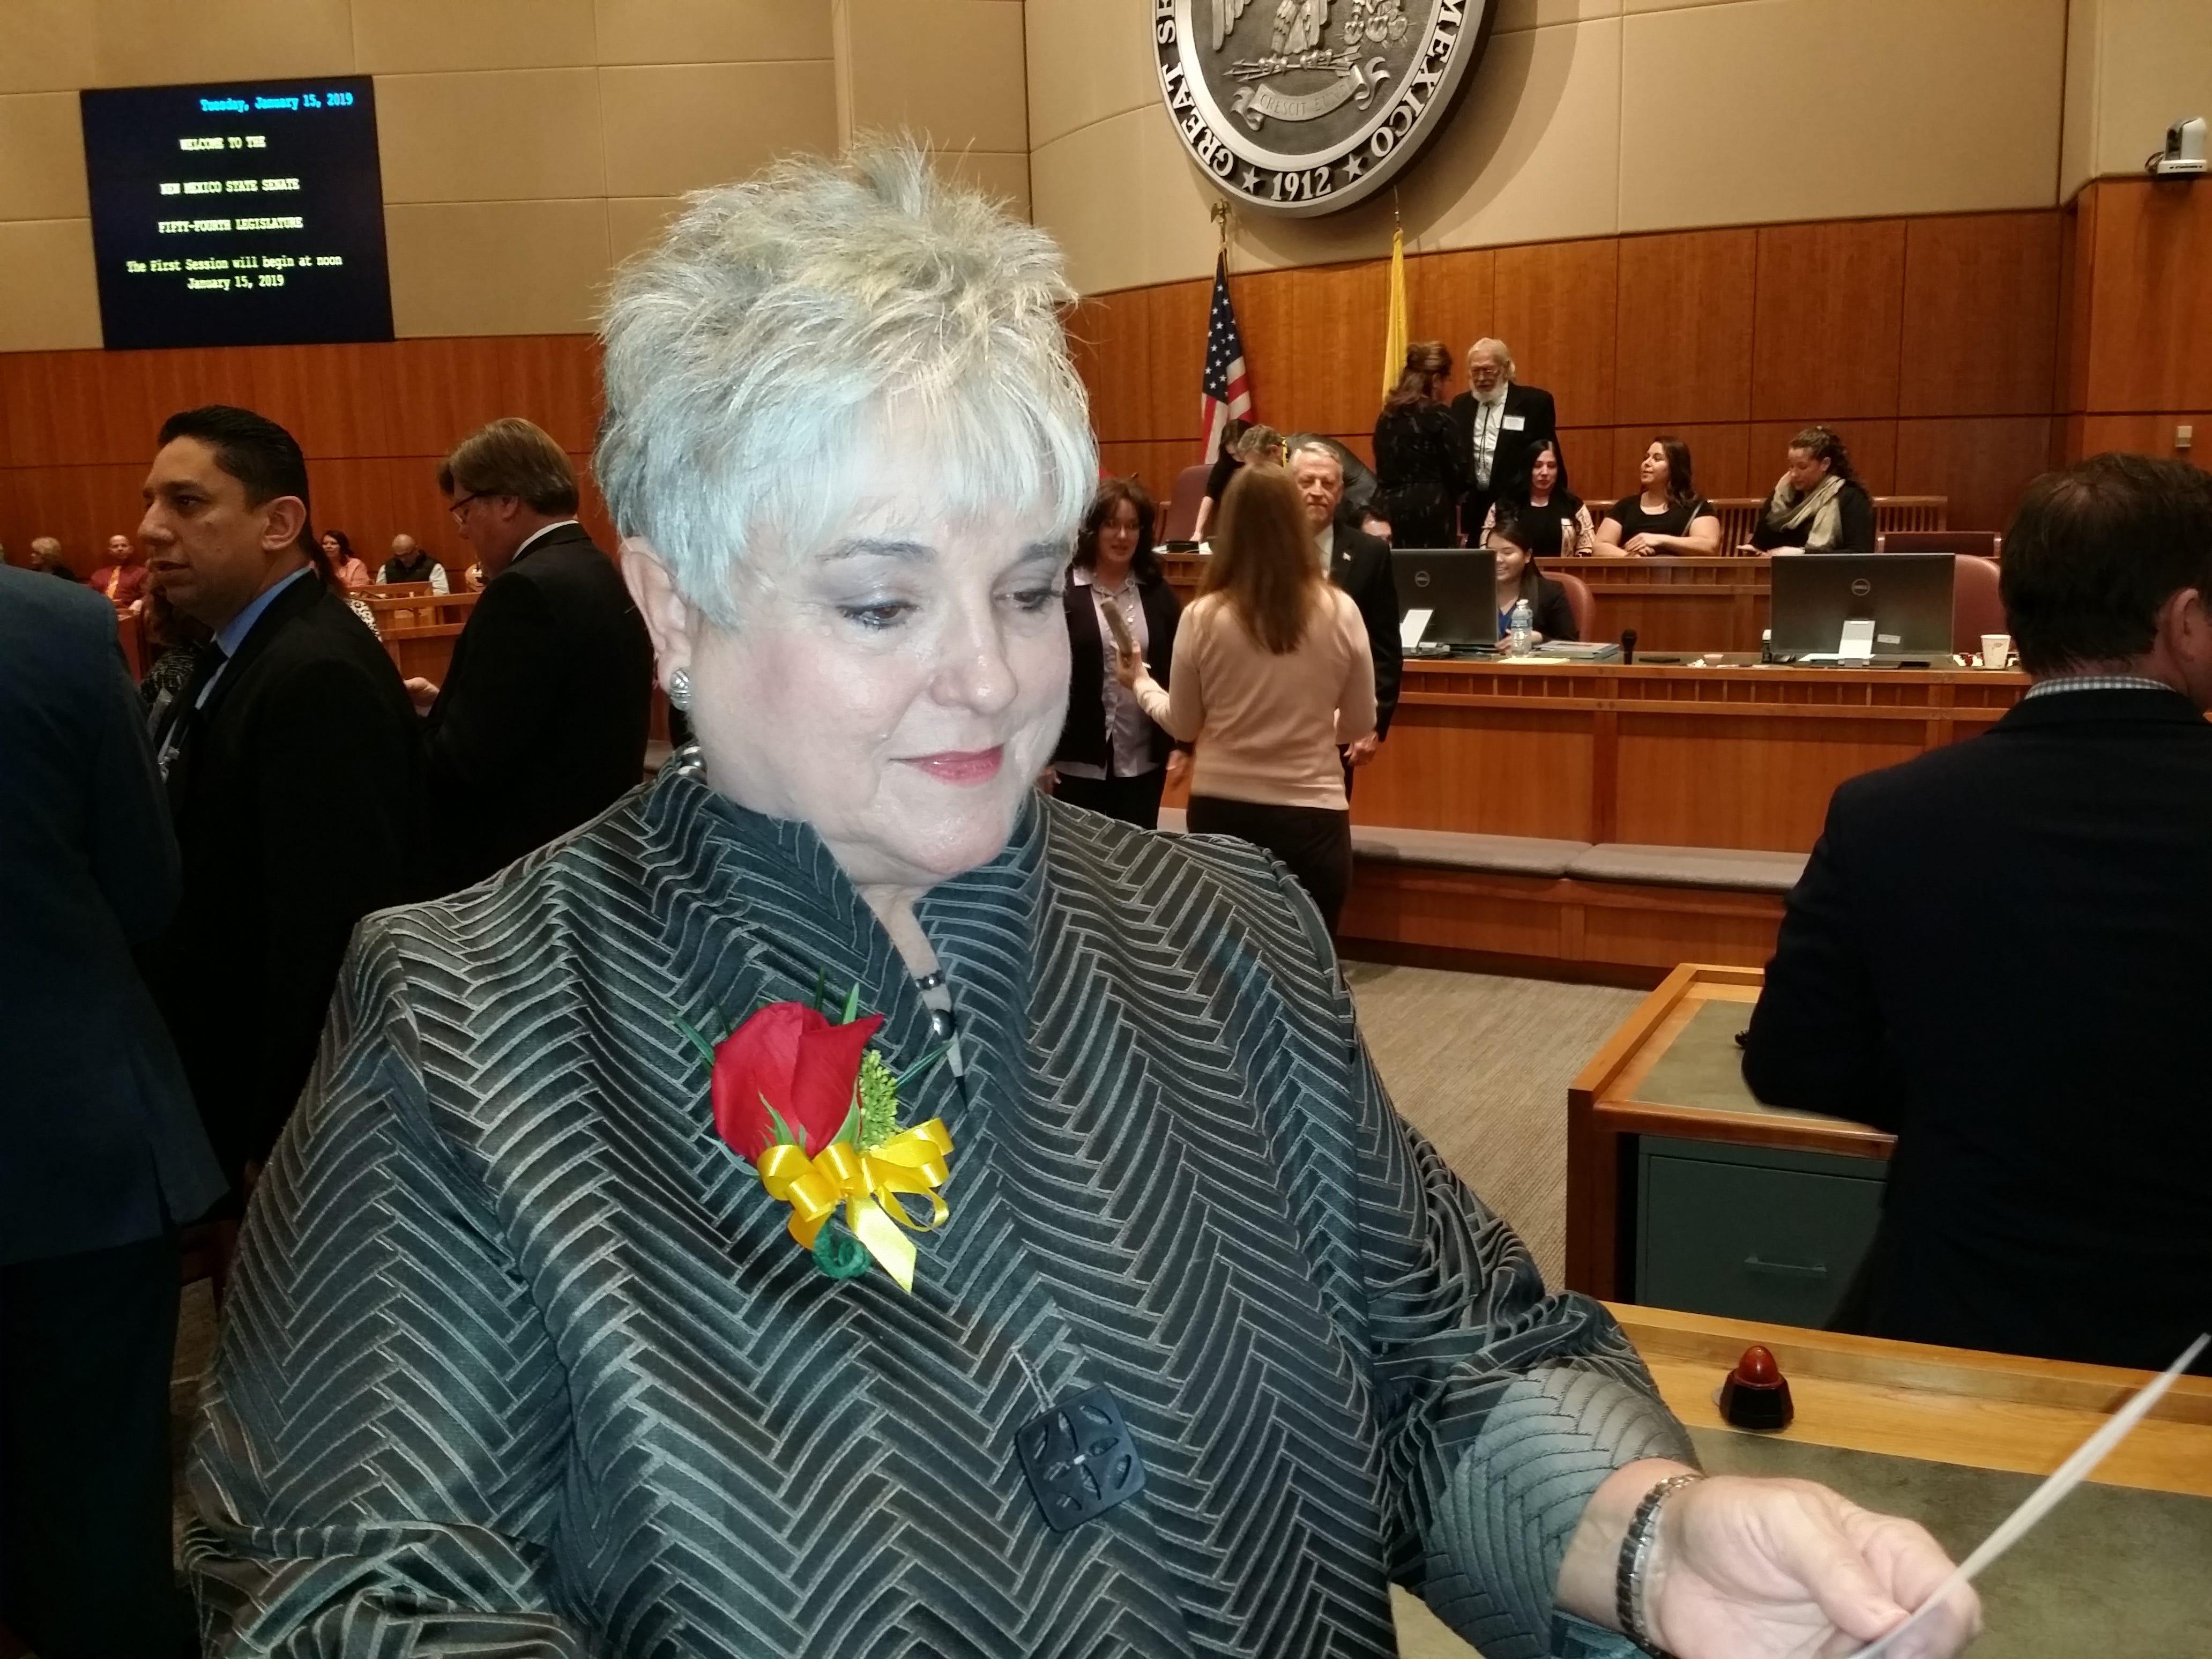 Sen. Gay Kernan during the opening of the 2018 Legislative Session in Santa Fe Jan. 15